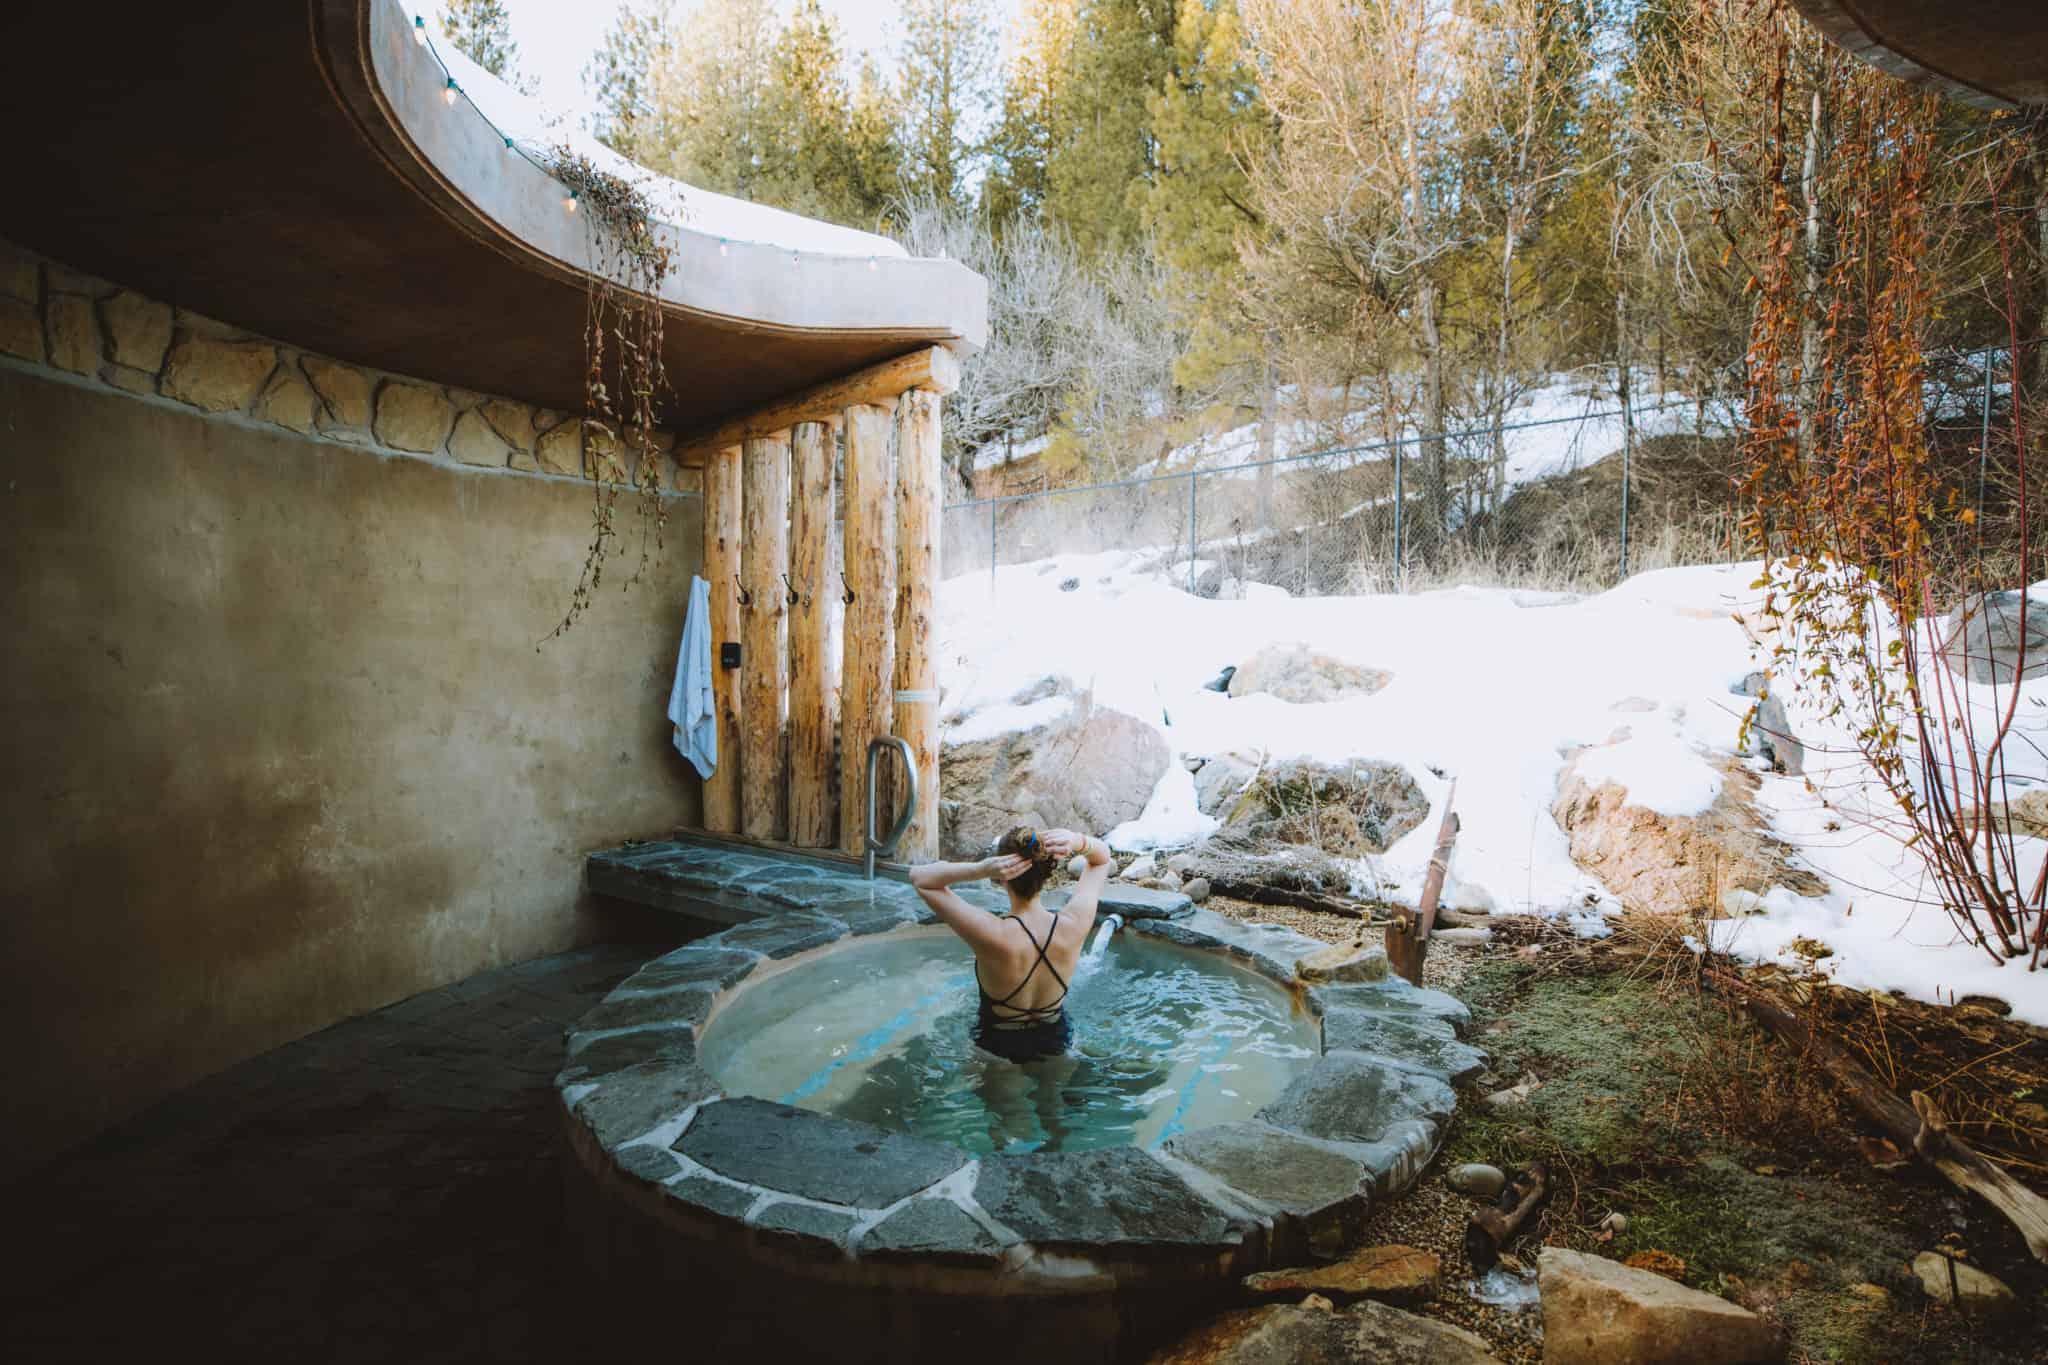 Nude outdoor hot springs